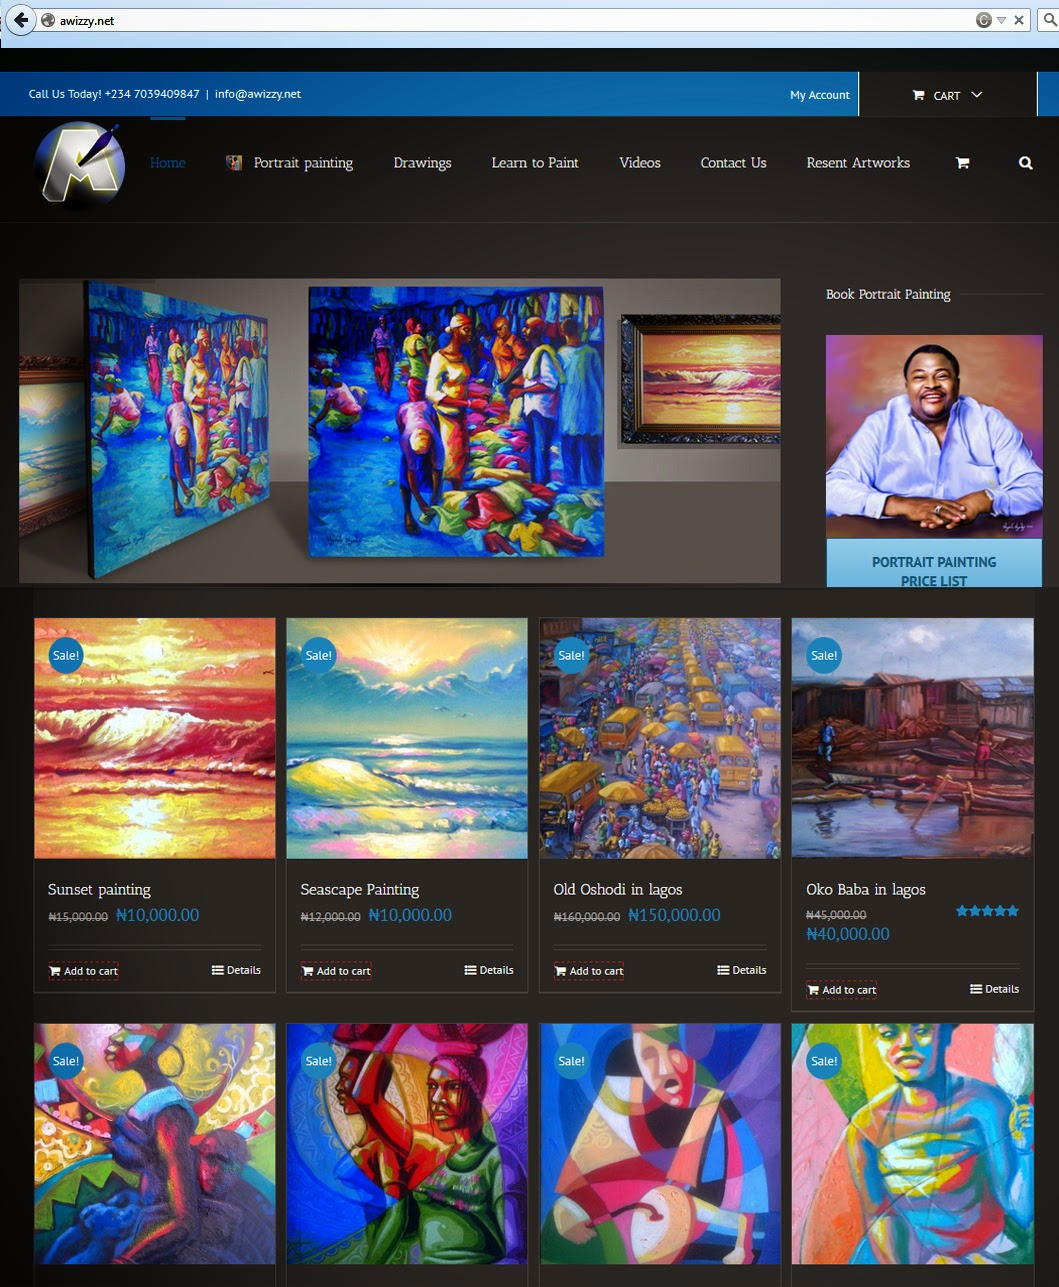 nigeria no 1 online art gallery http://www.awizzy.net